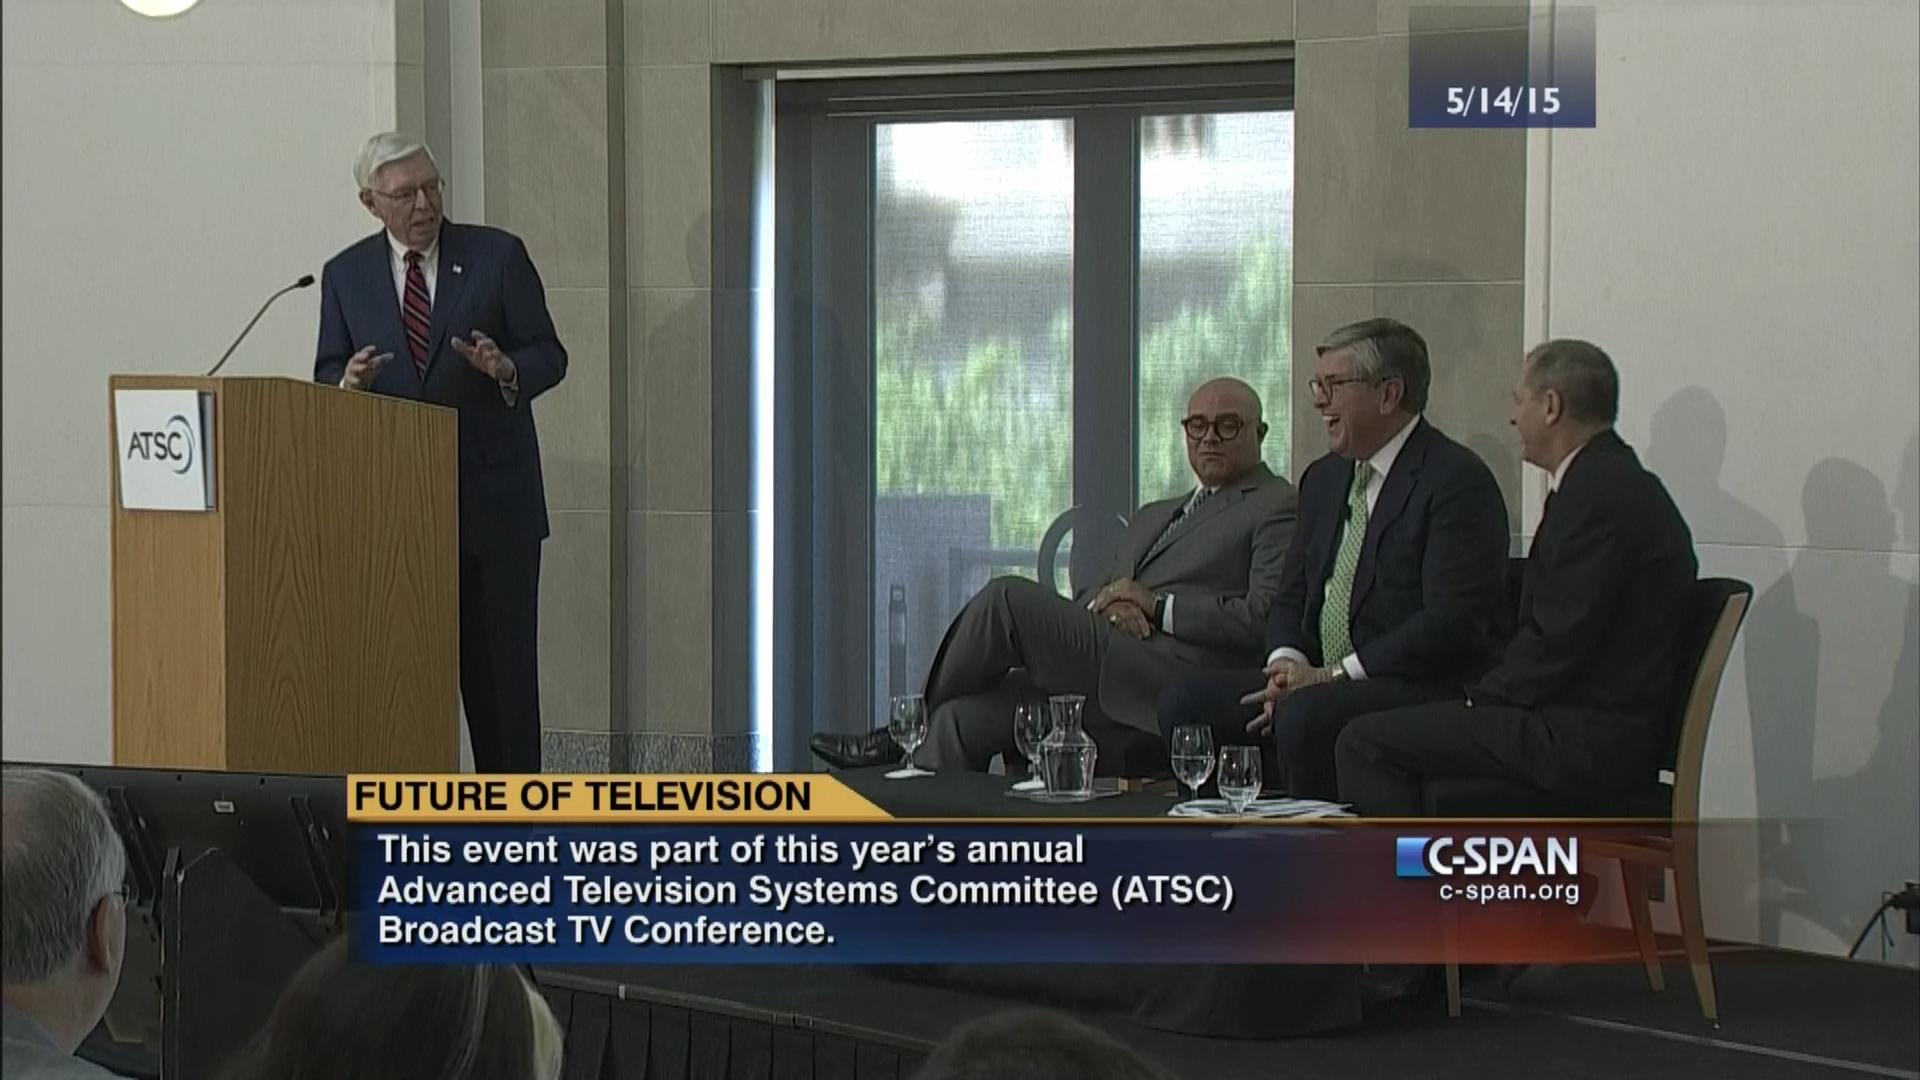 Dick wiley hdtv speech